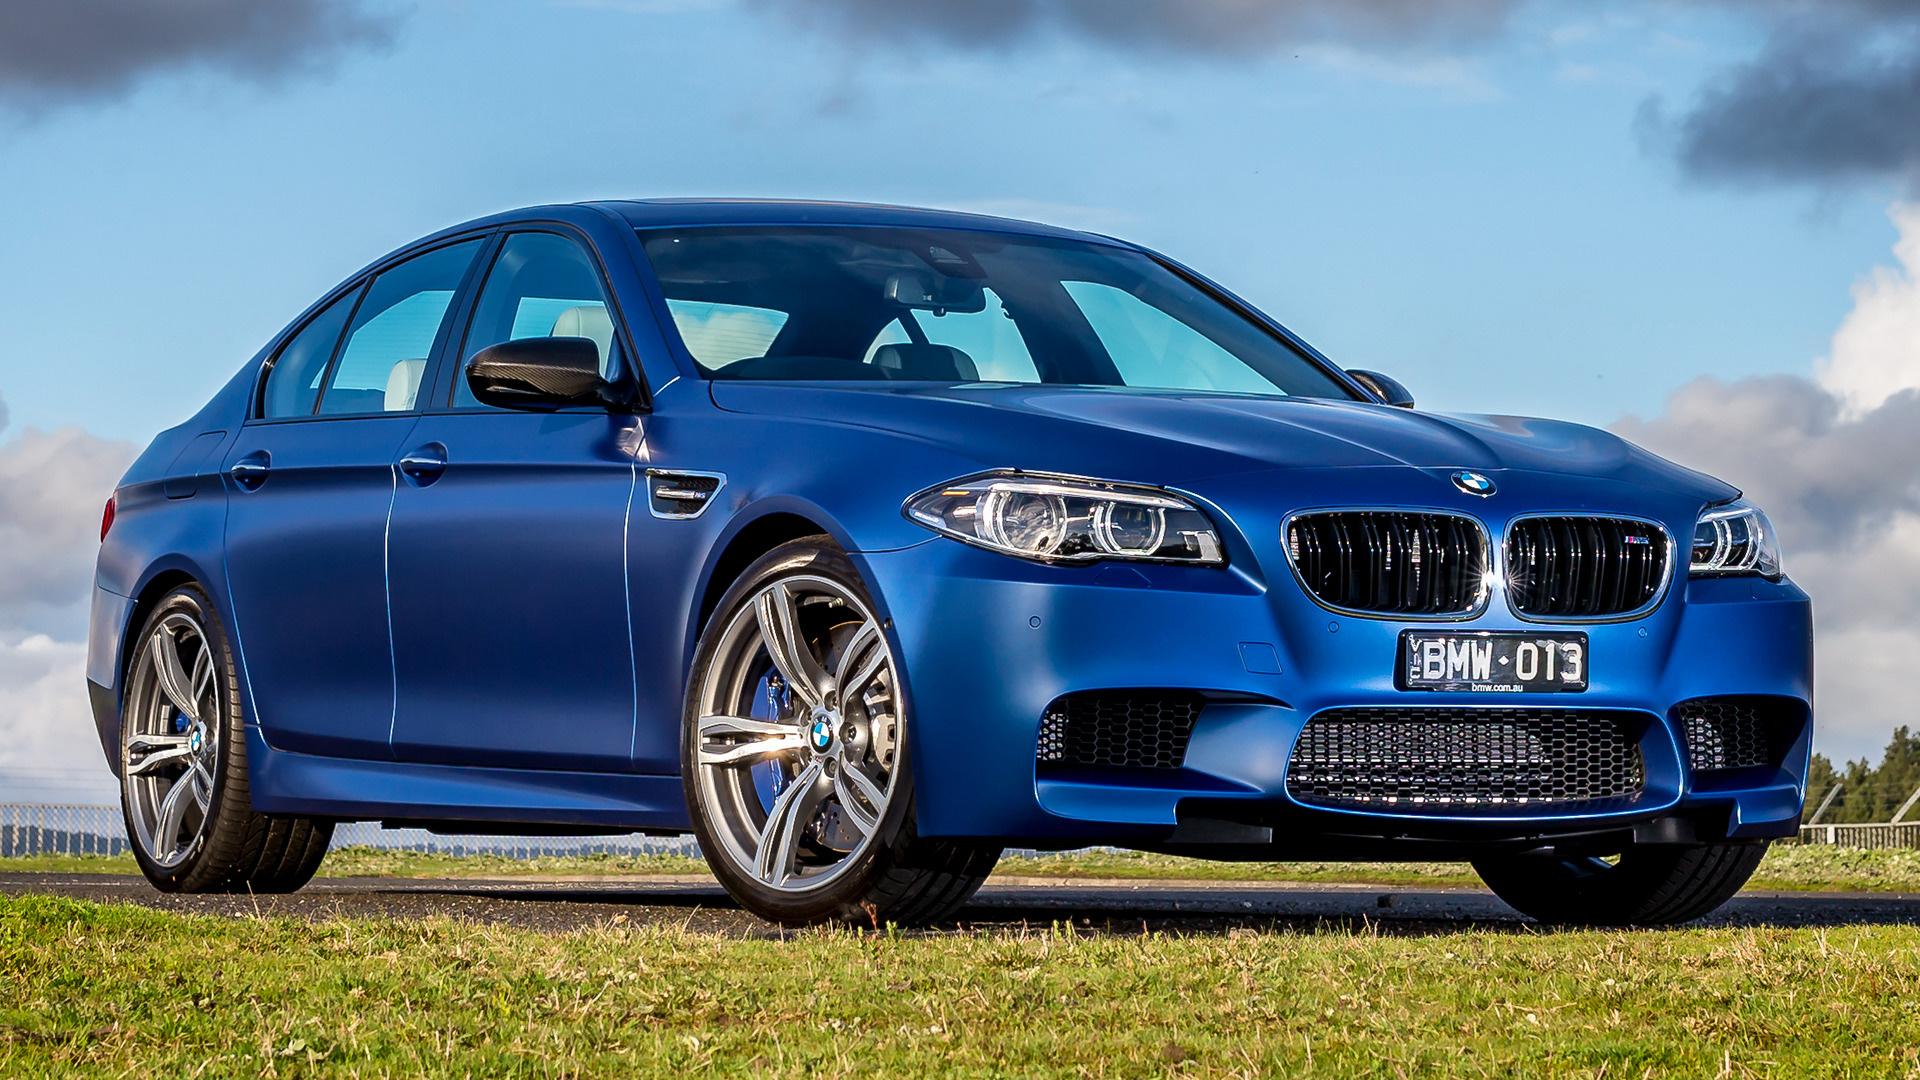 BMW M5 Pure Edition 32741 1920x1080